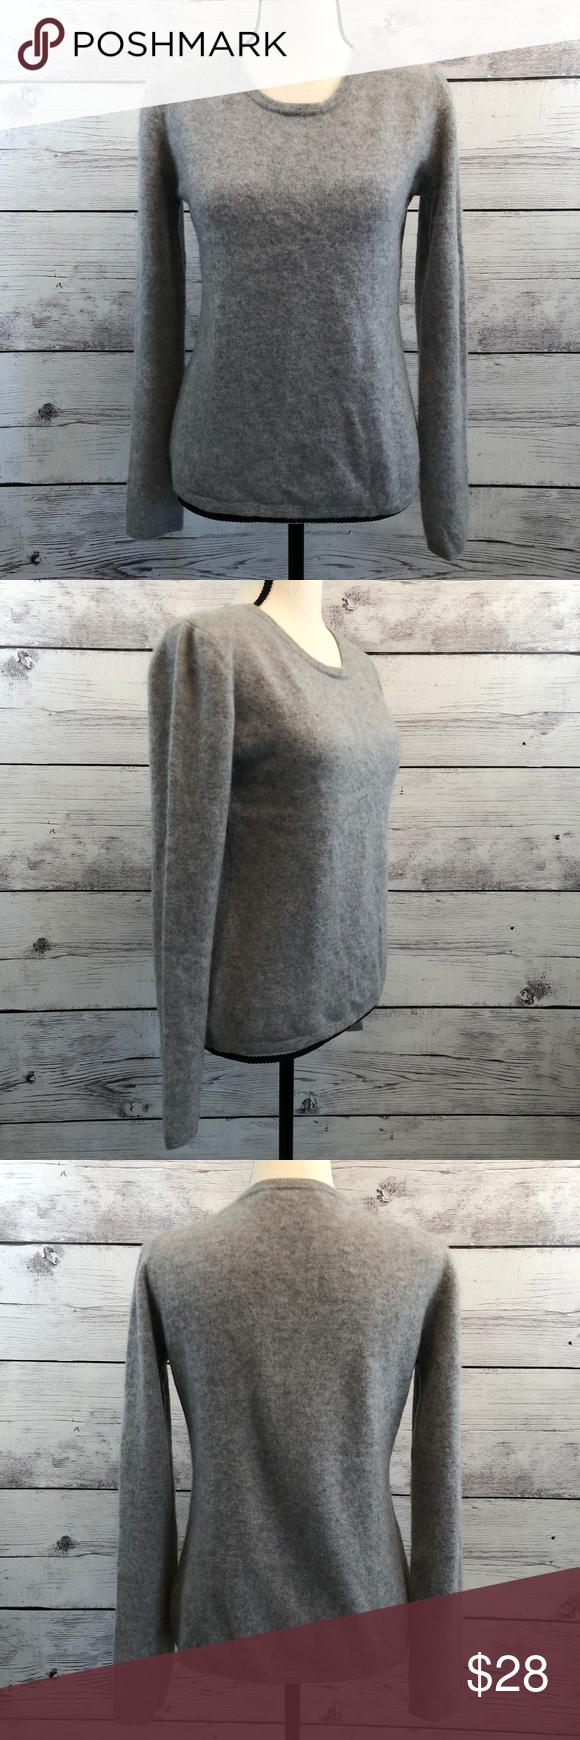 Preswick & Moore Womens Cashmere Sweater Large Preswick